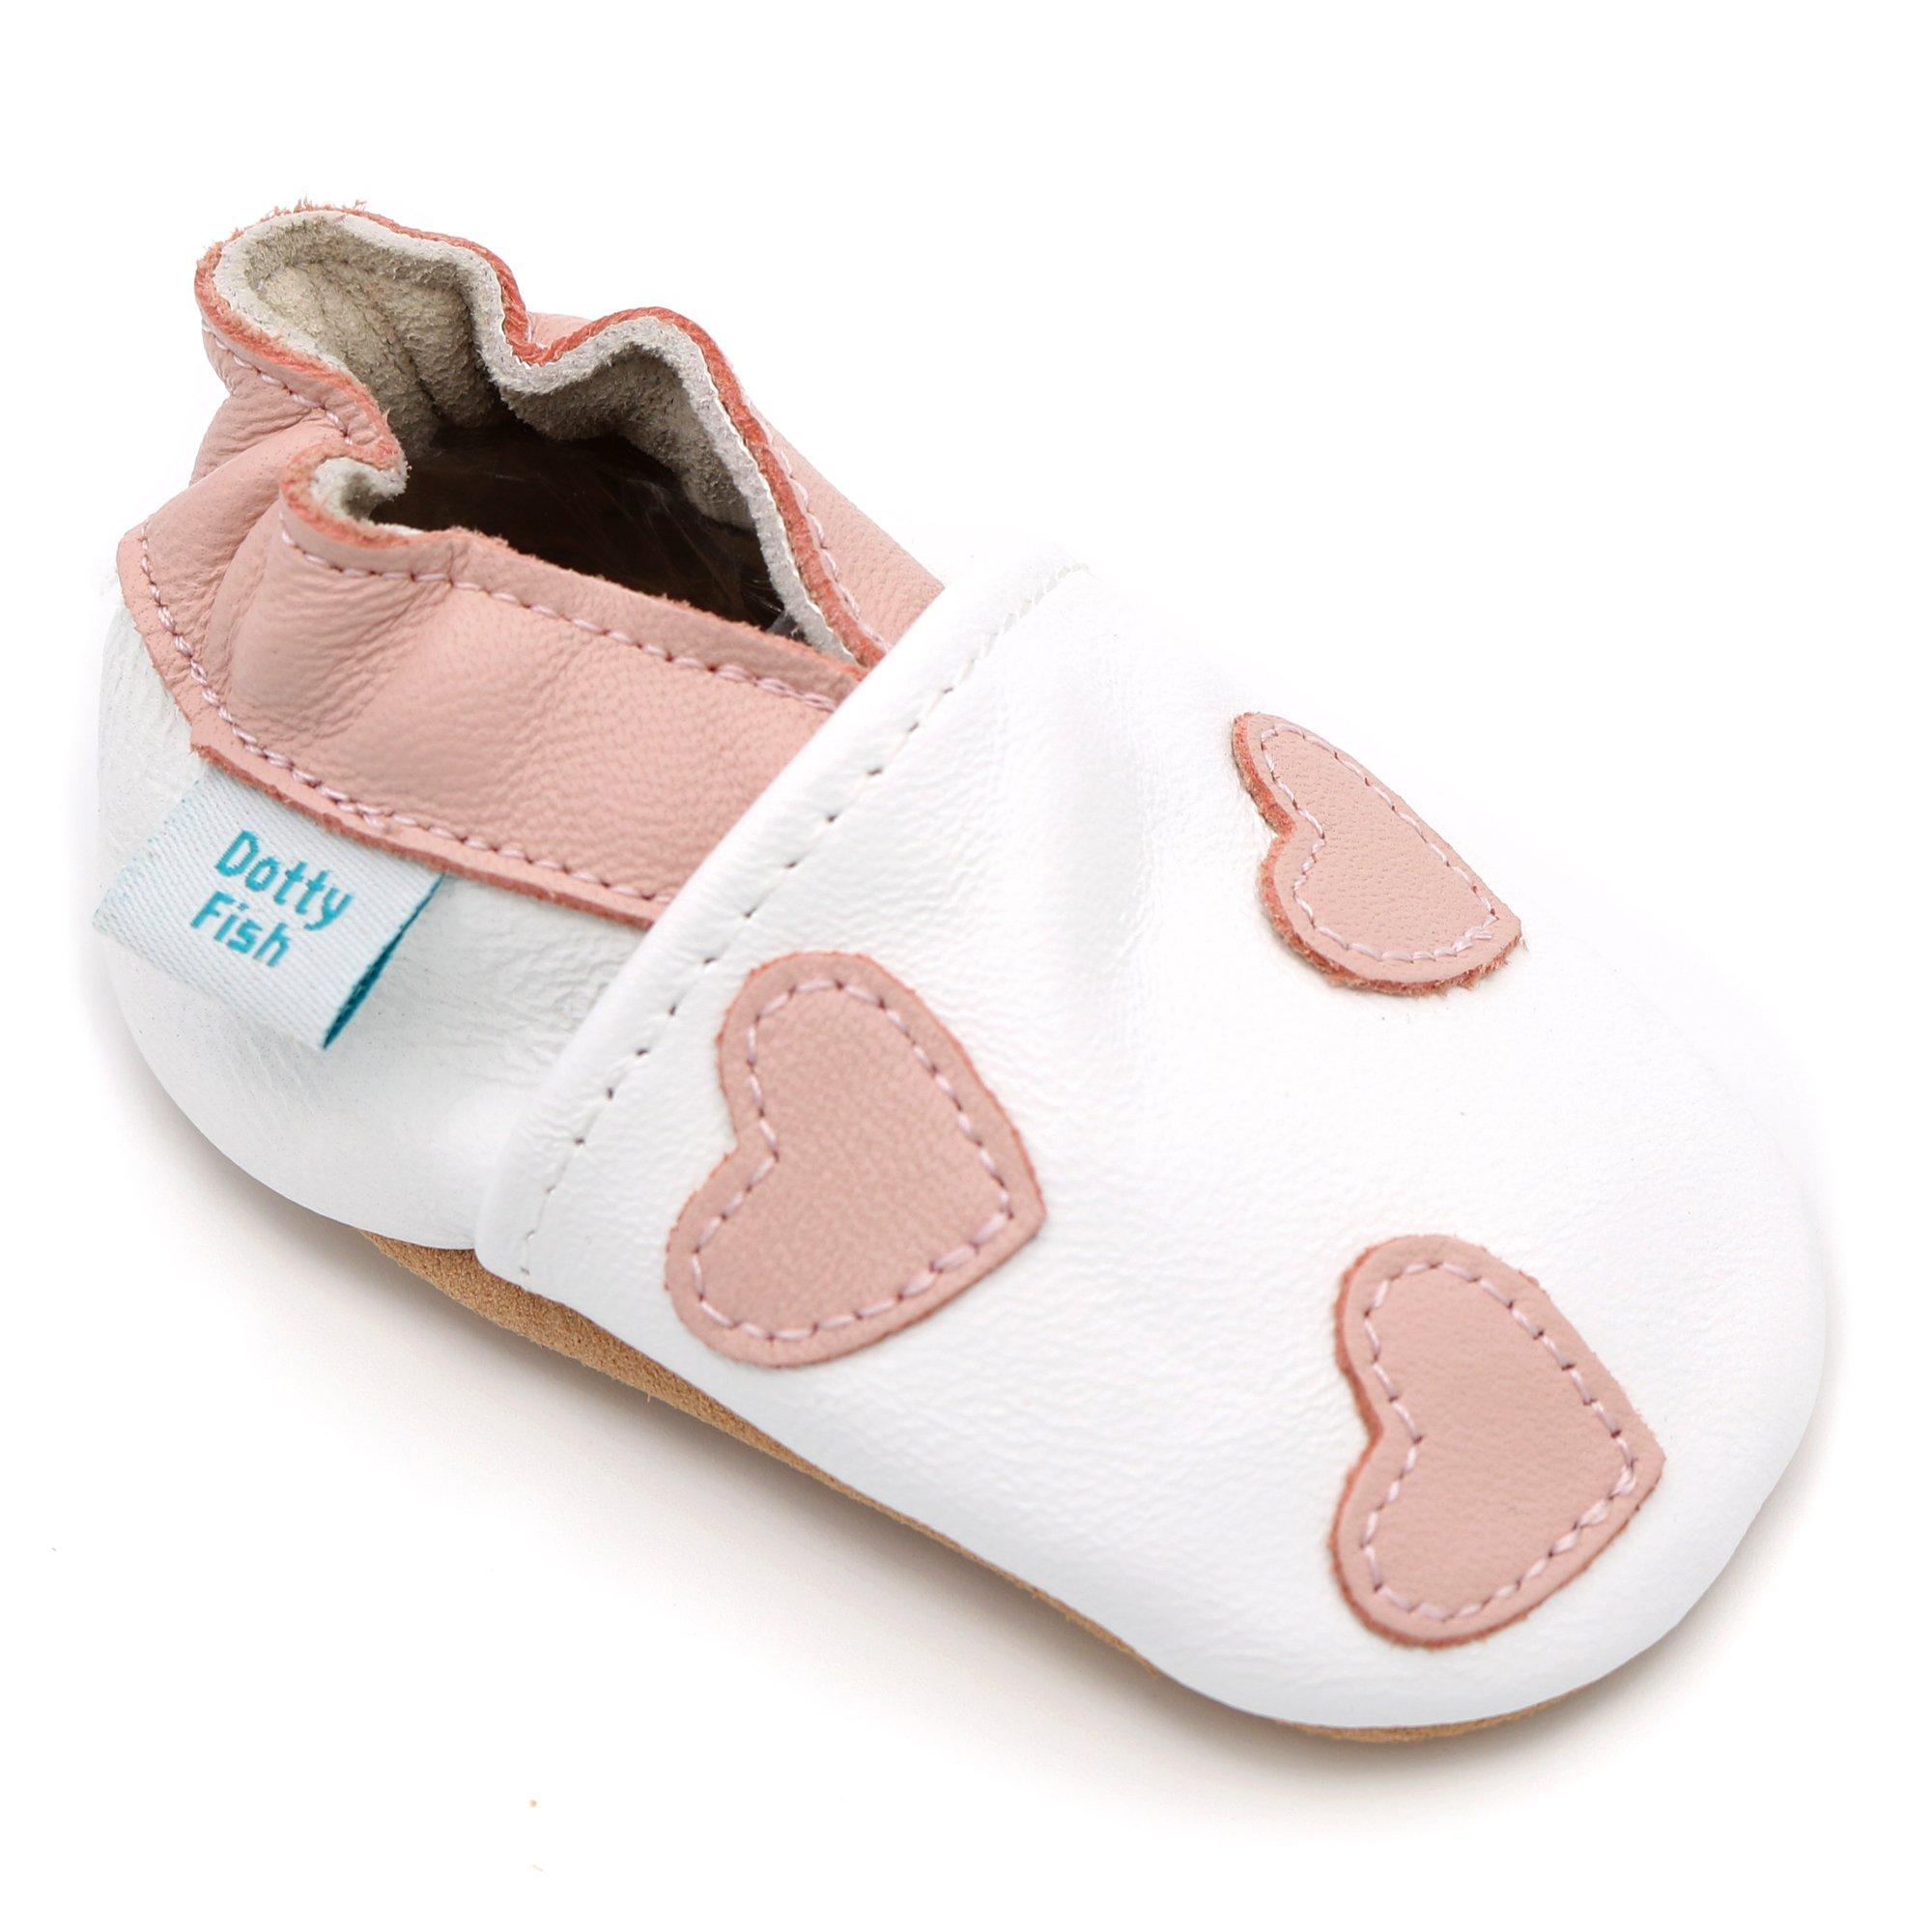 0-12Month Baby Girl Barefoot Sandals Christening Wedding Soft Flower Shoes LA2